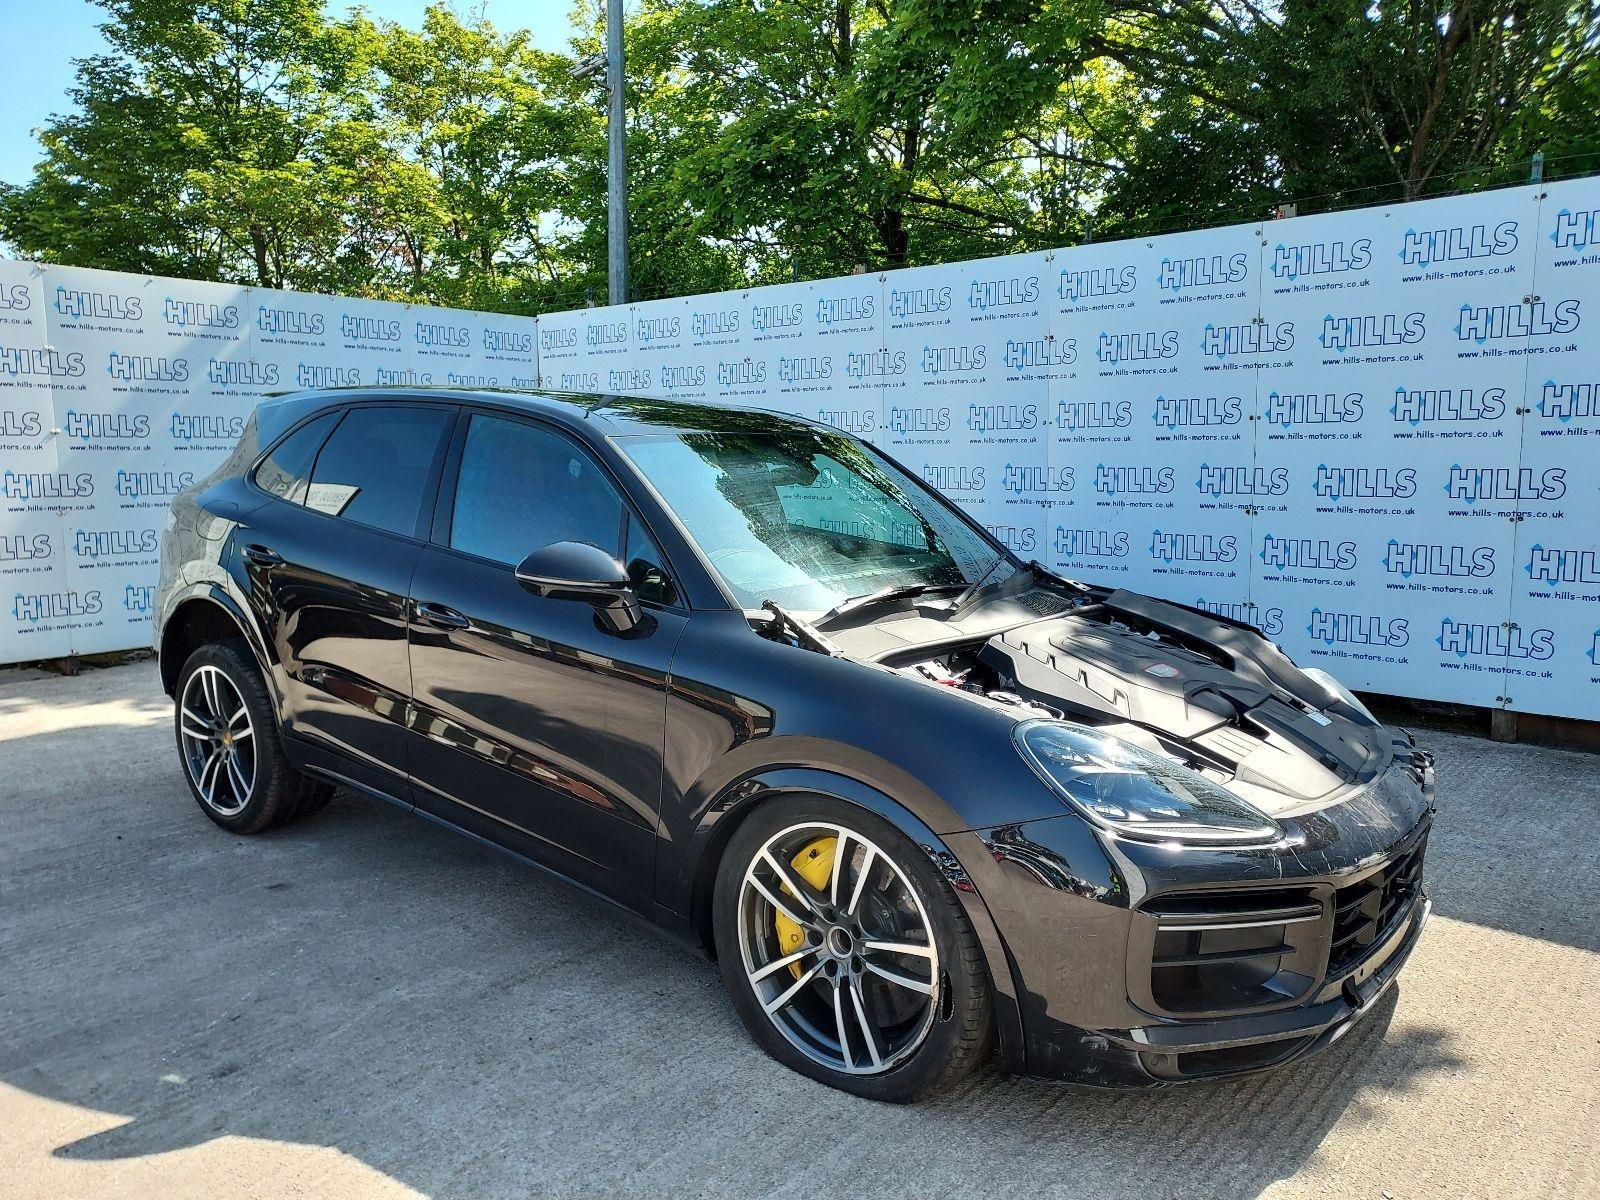 2018 Porsche Cayenne V8 T TIPTRONIC 3996cc TURBO Petrol Automatic 8 Speed ESTATE